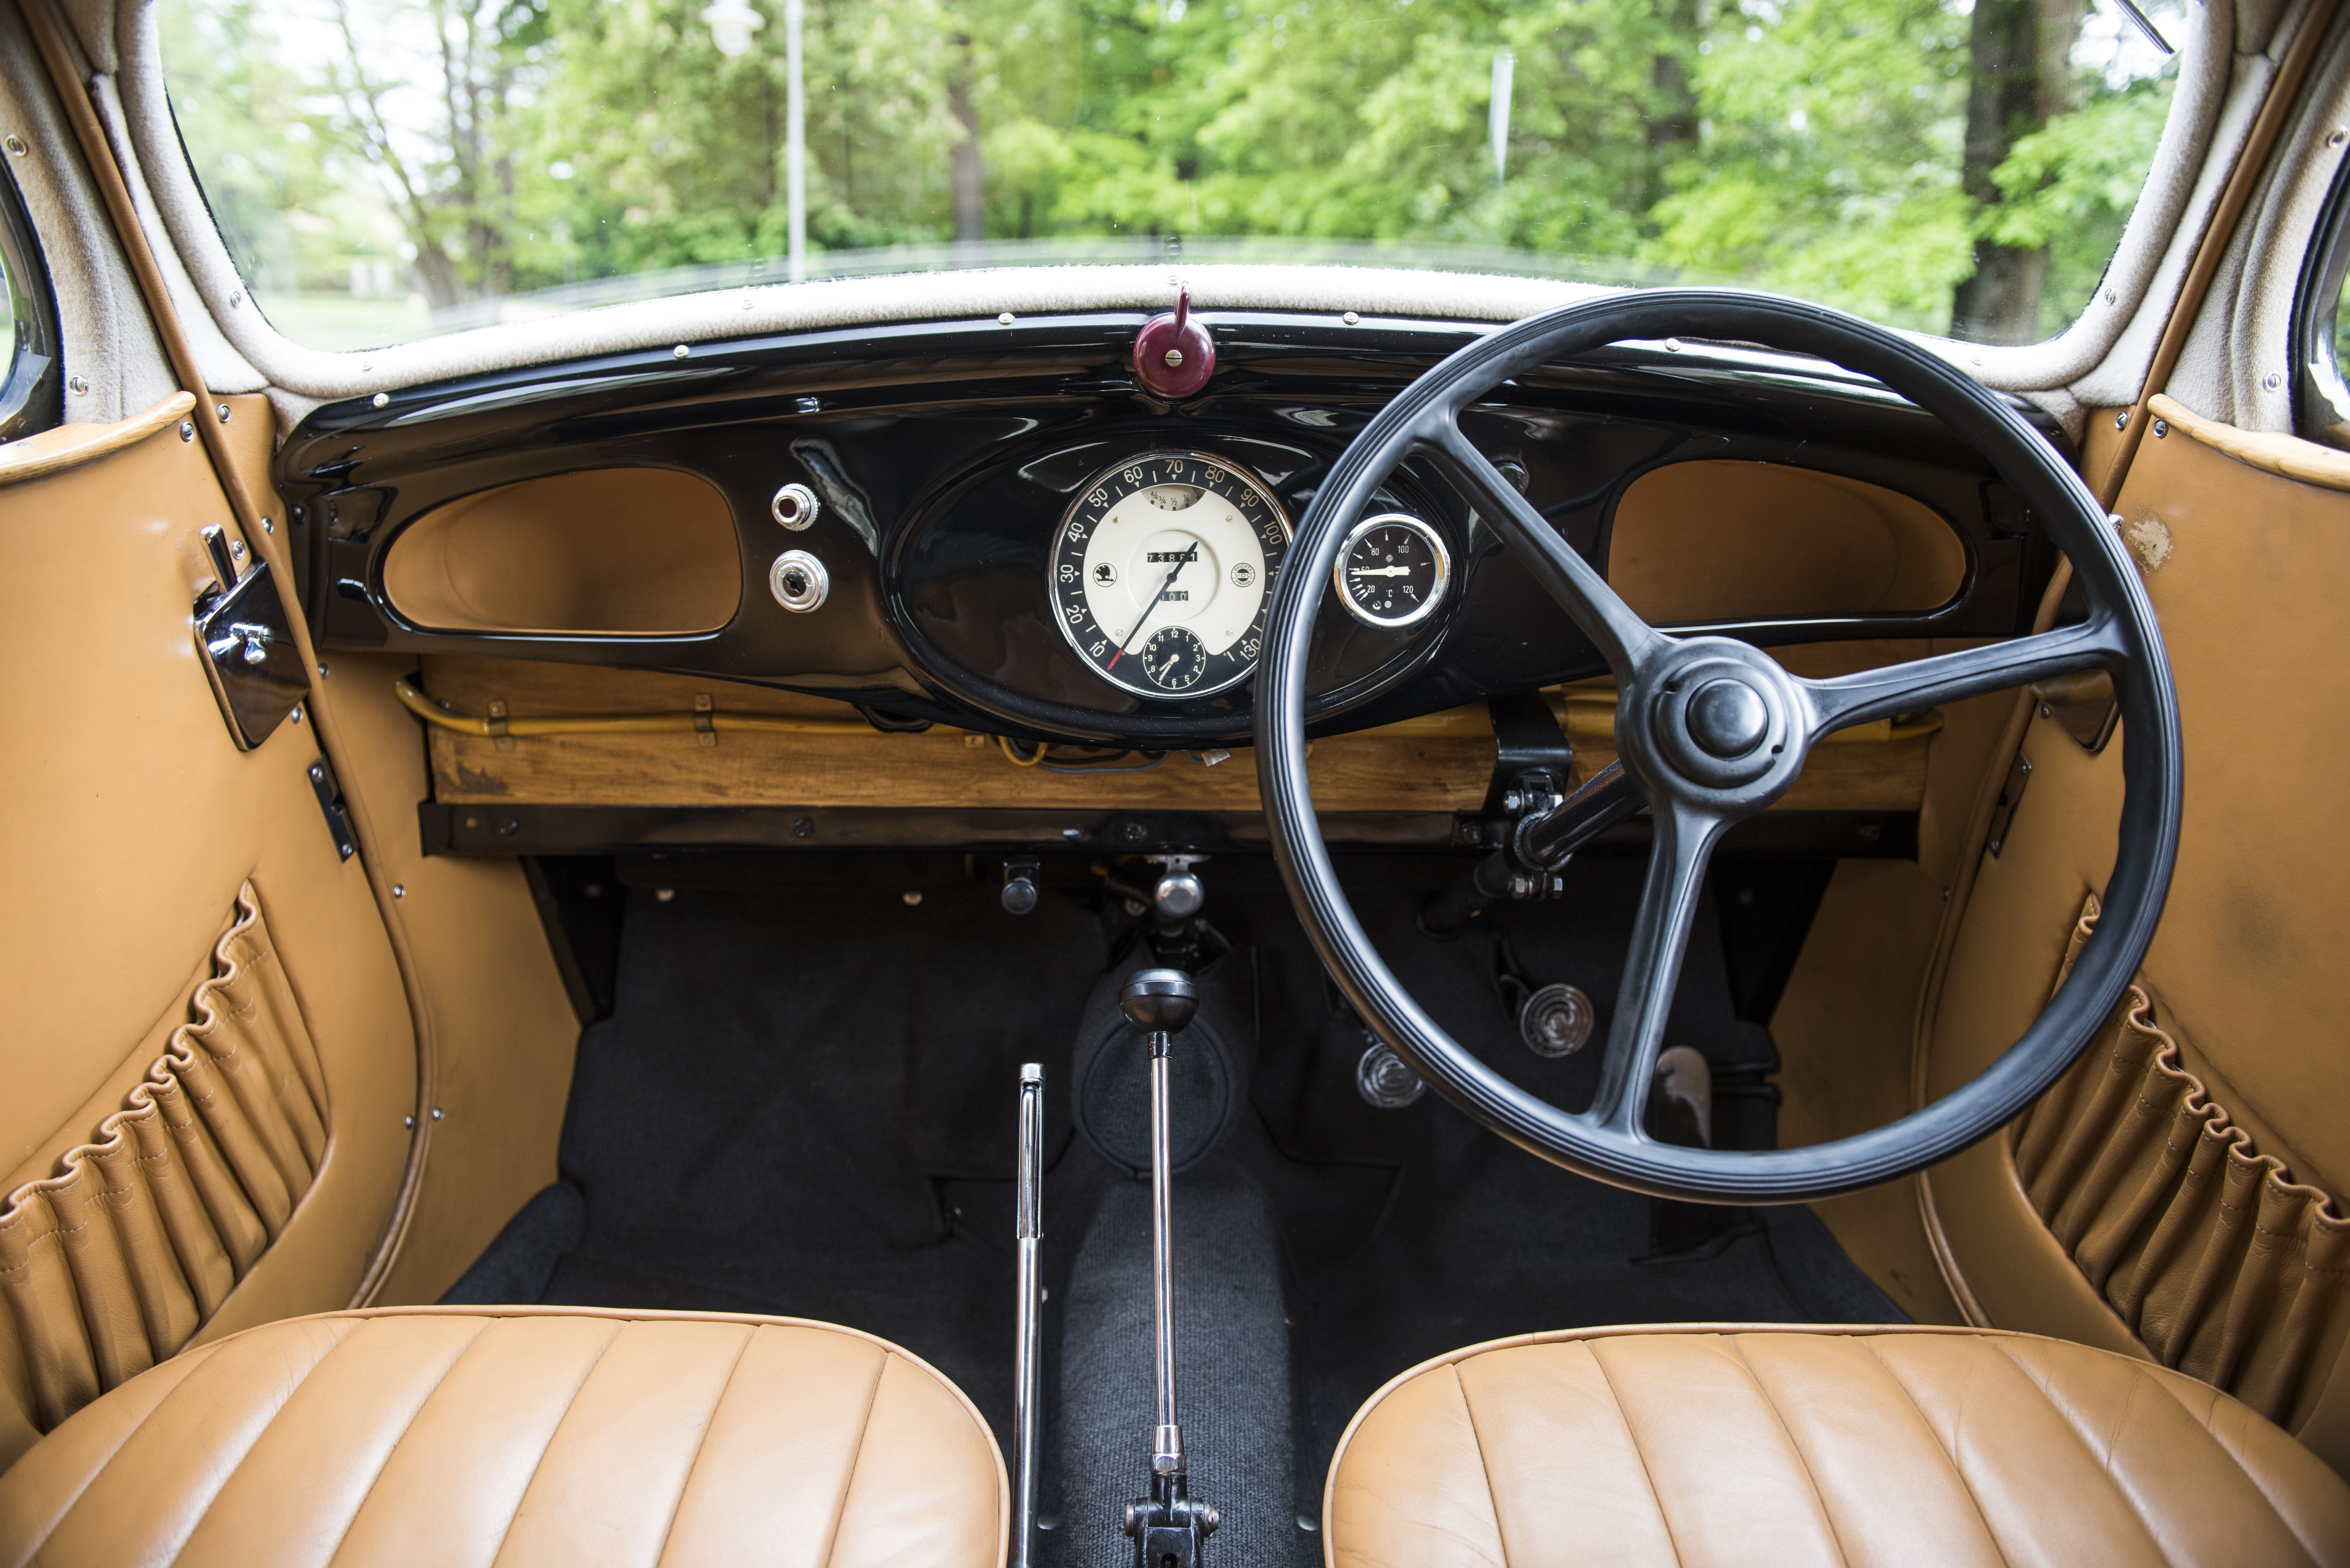 SKODA POPULAR Monte Carlo (1936–1939): The elegant model with rally DNA - Image 3